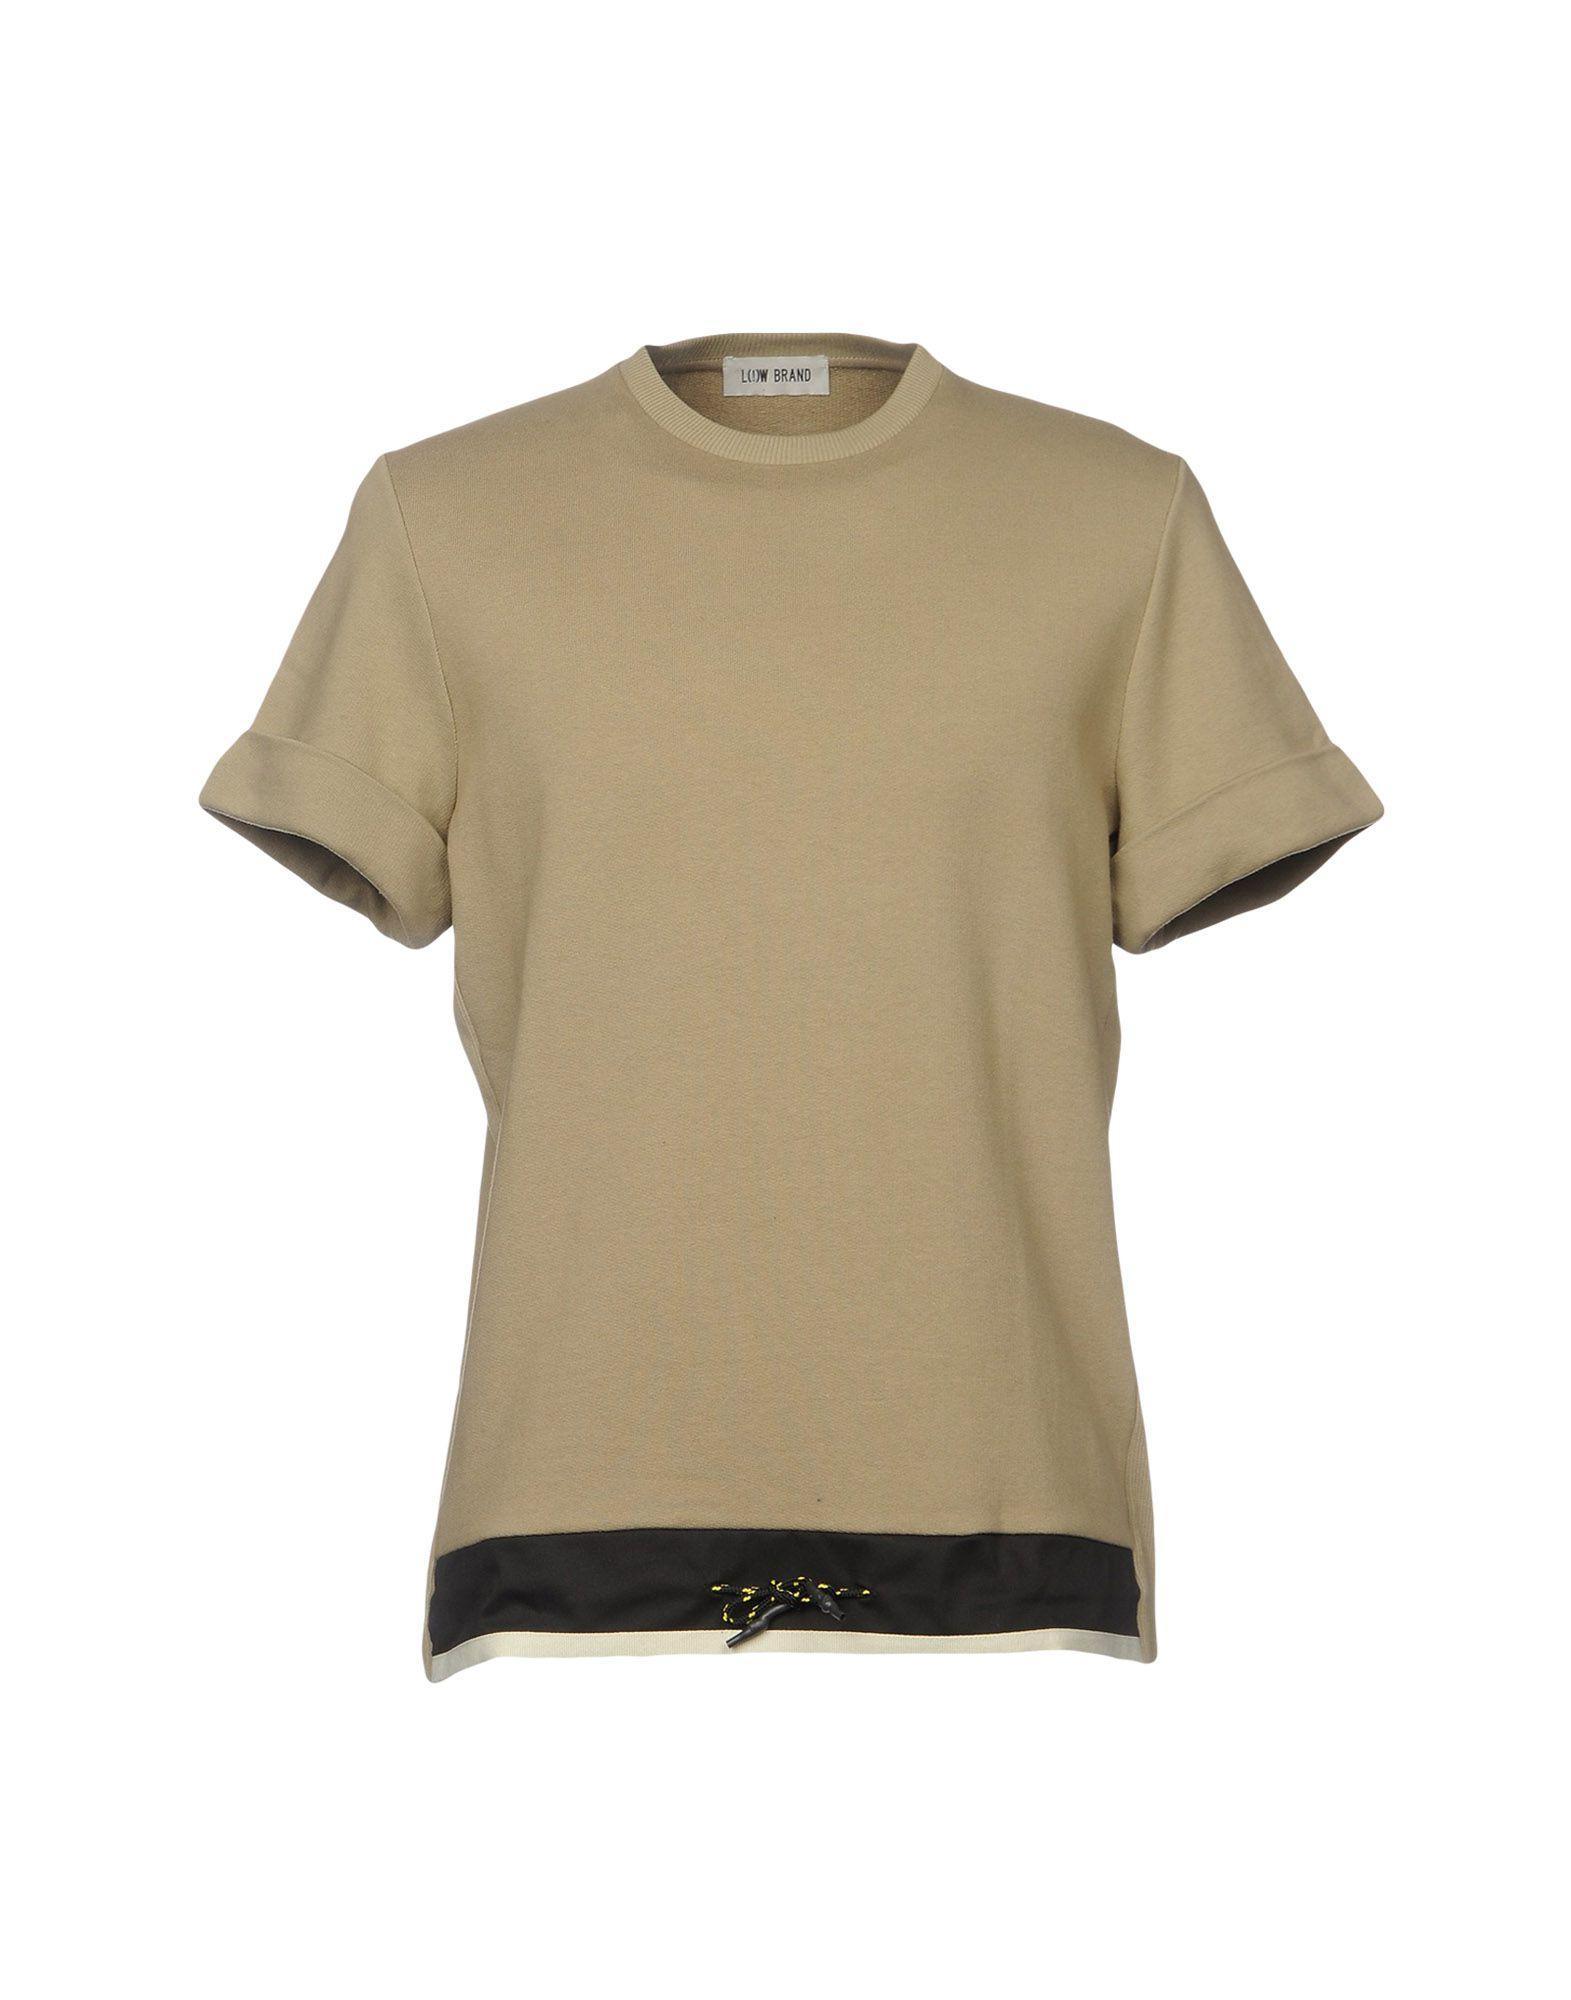 Low Brand Sweatshirt In Khaki